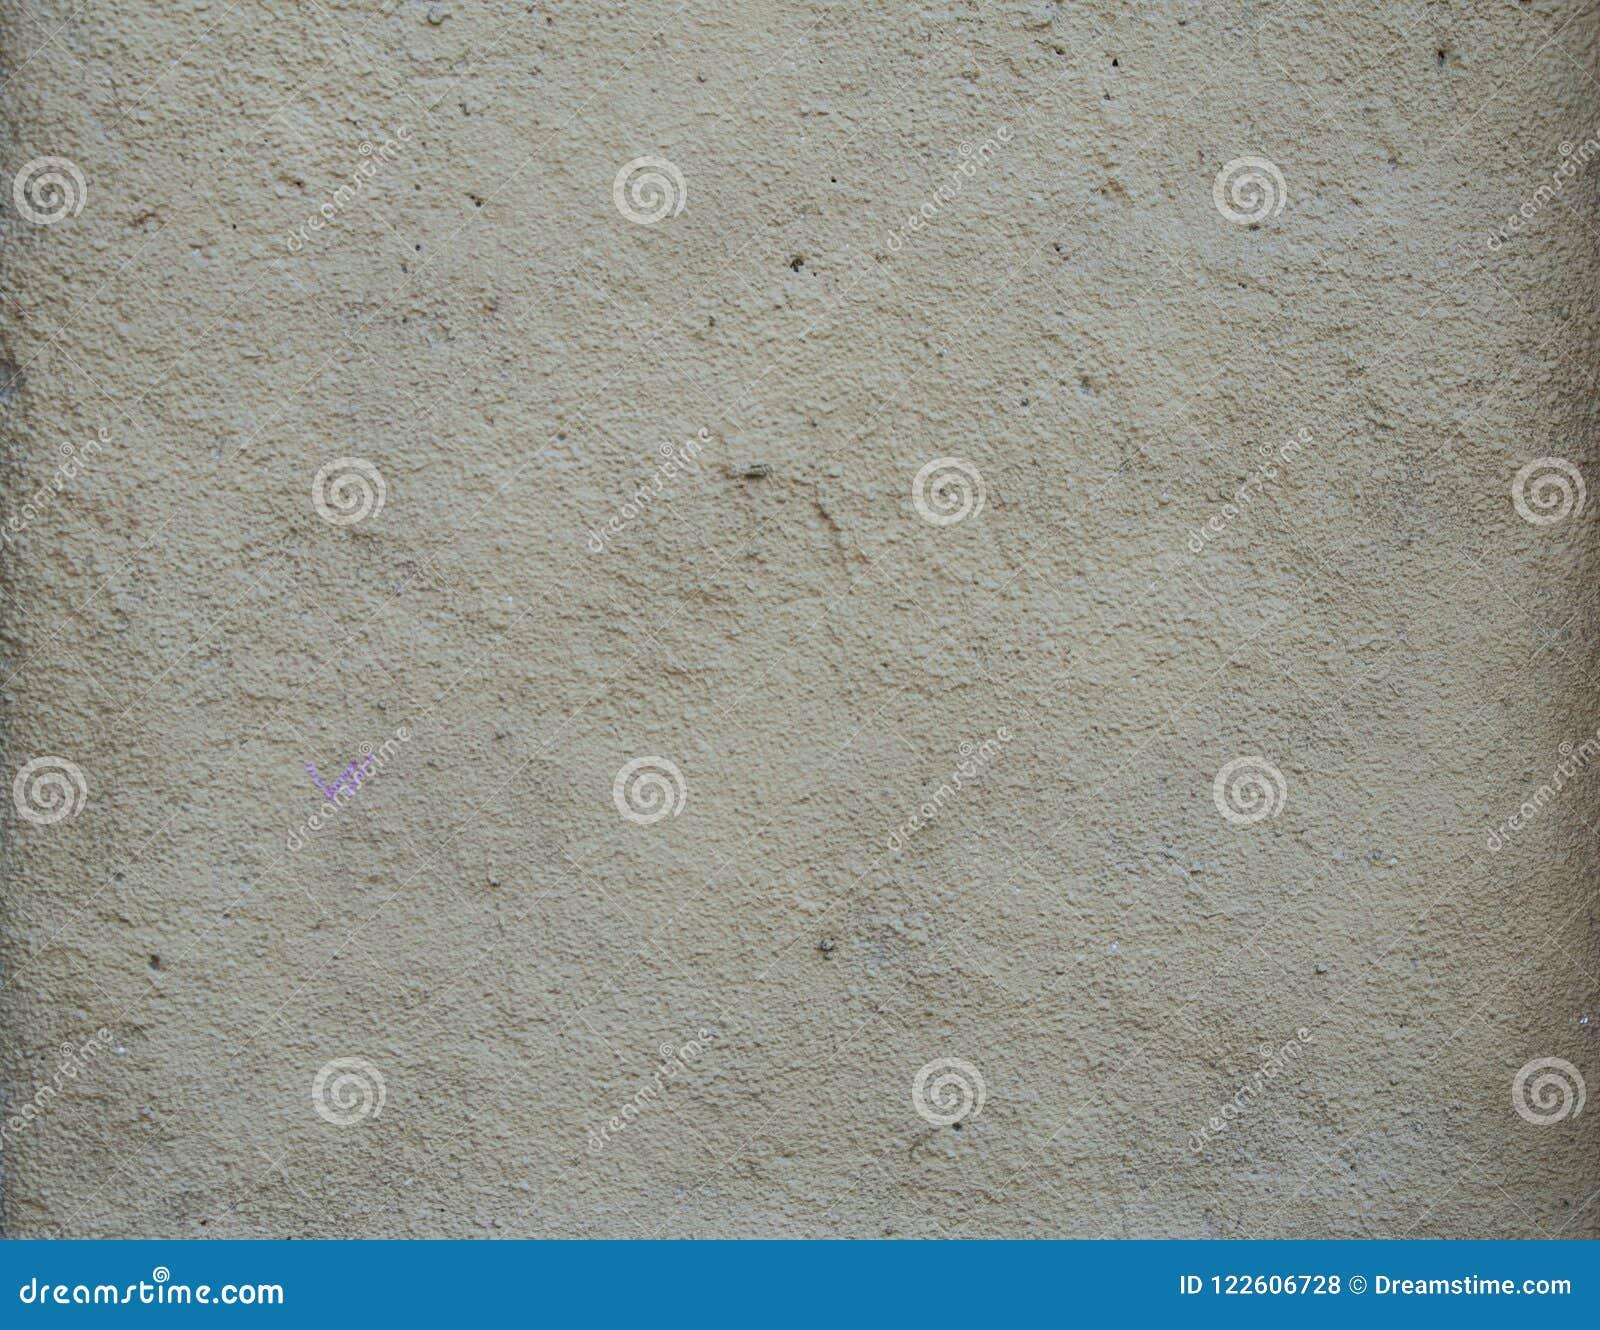 Teinte De Gris Clair texture teinte pierreuse gris-clair de fond de mur de rue